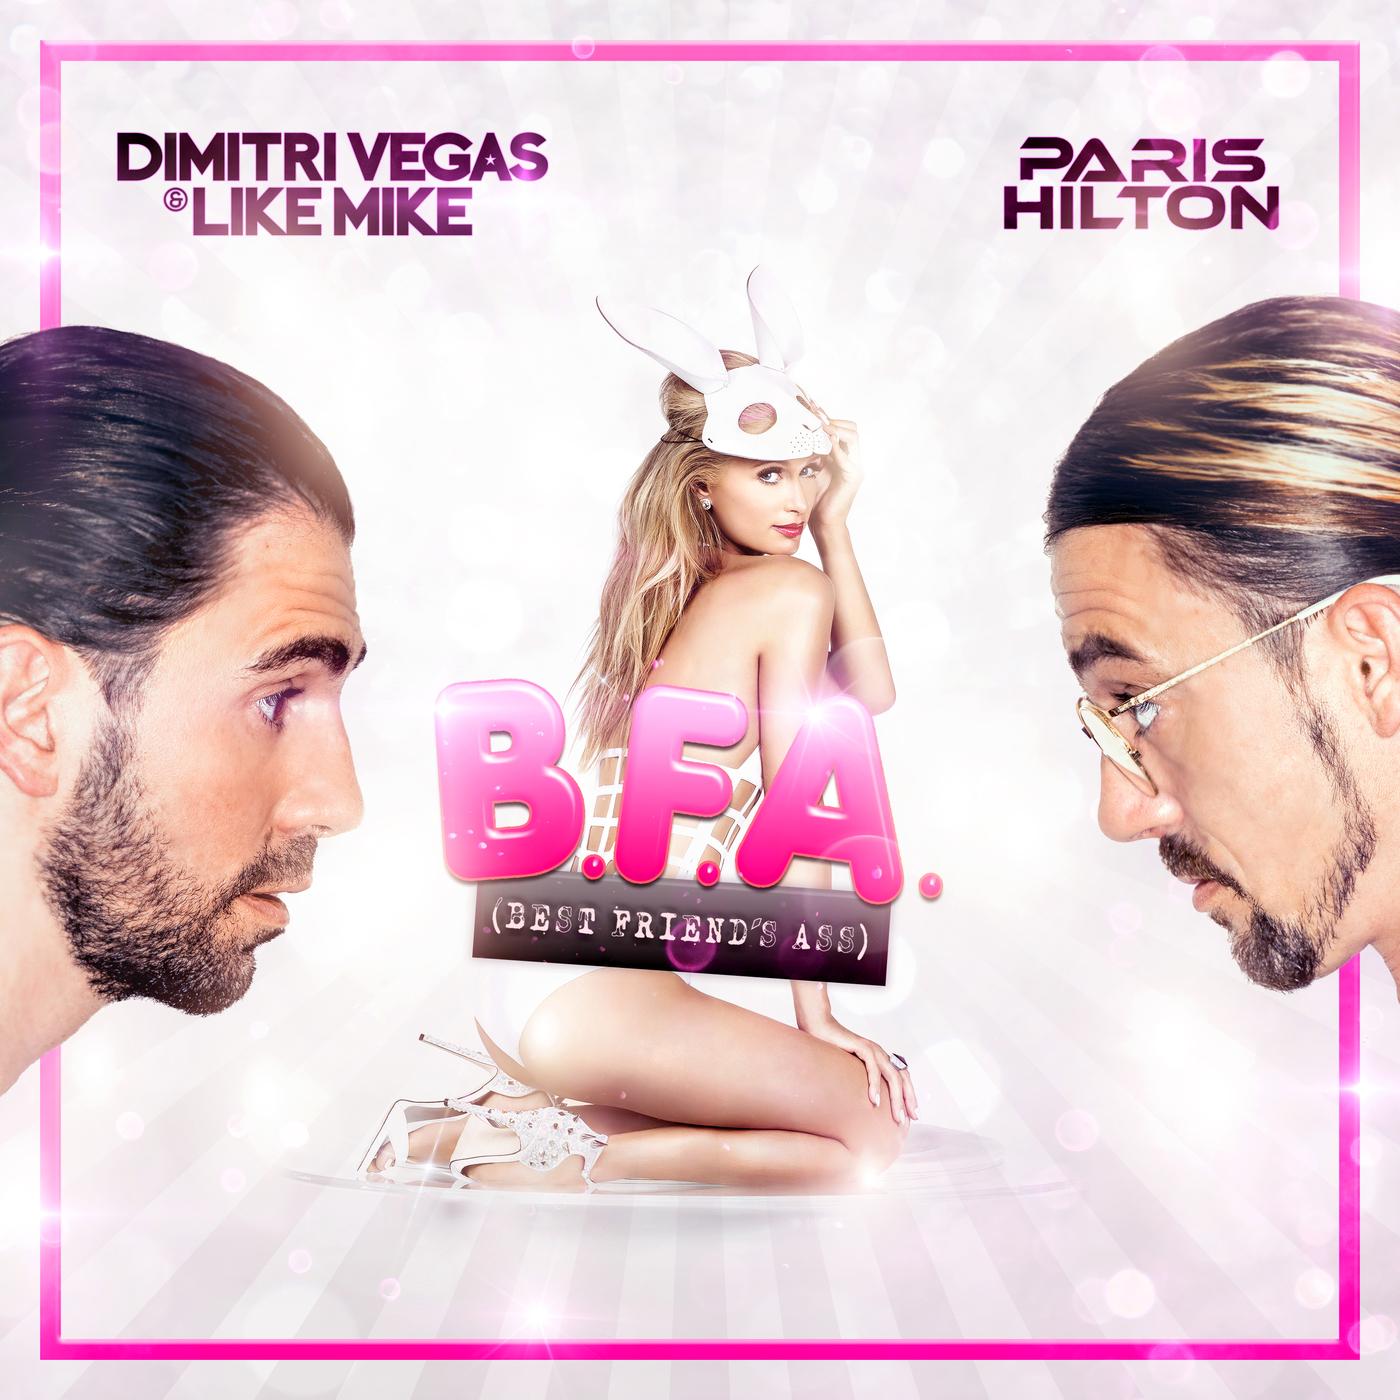 Best Friend's Ass - Dimitri Vegas & Like Mike